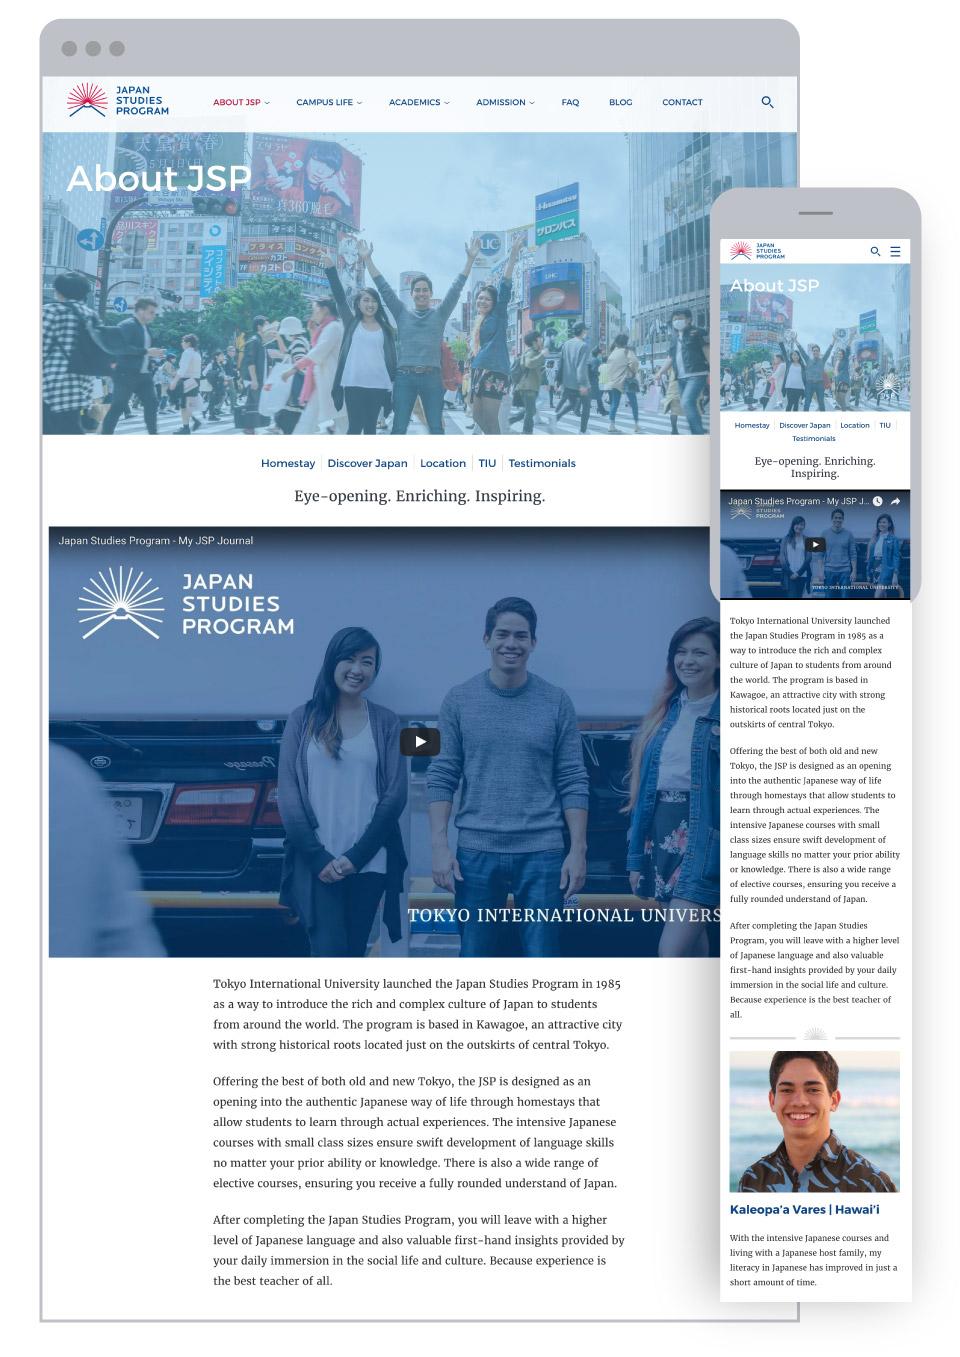 Japan Studies Program for Tokyo International University - About JSP Page with video